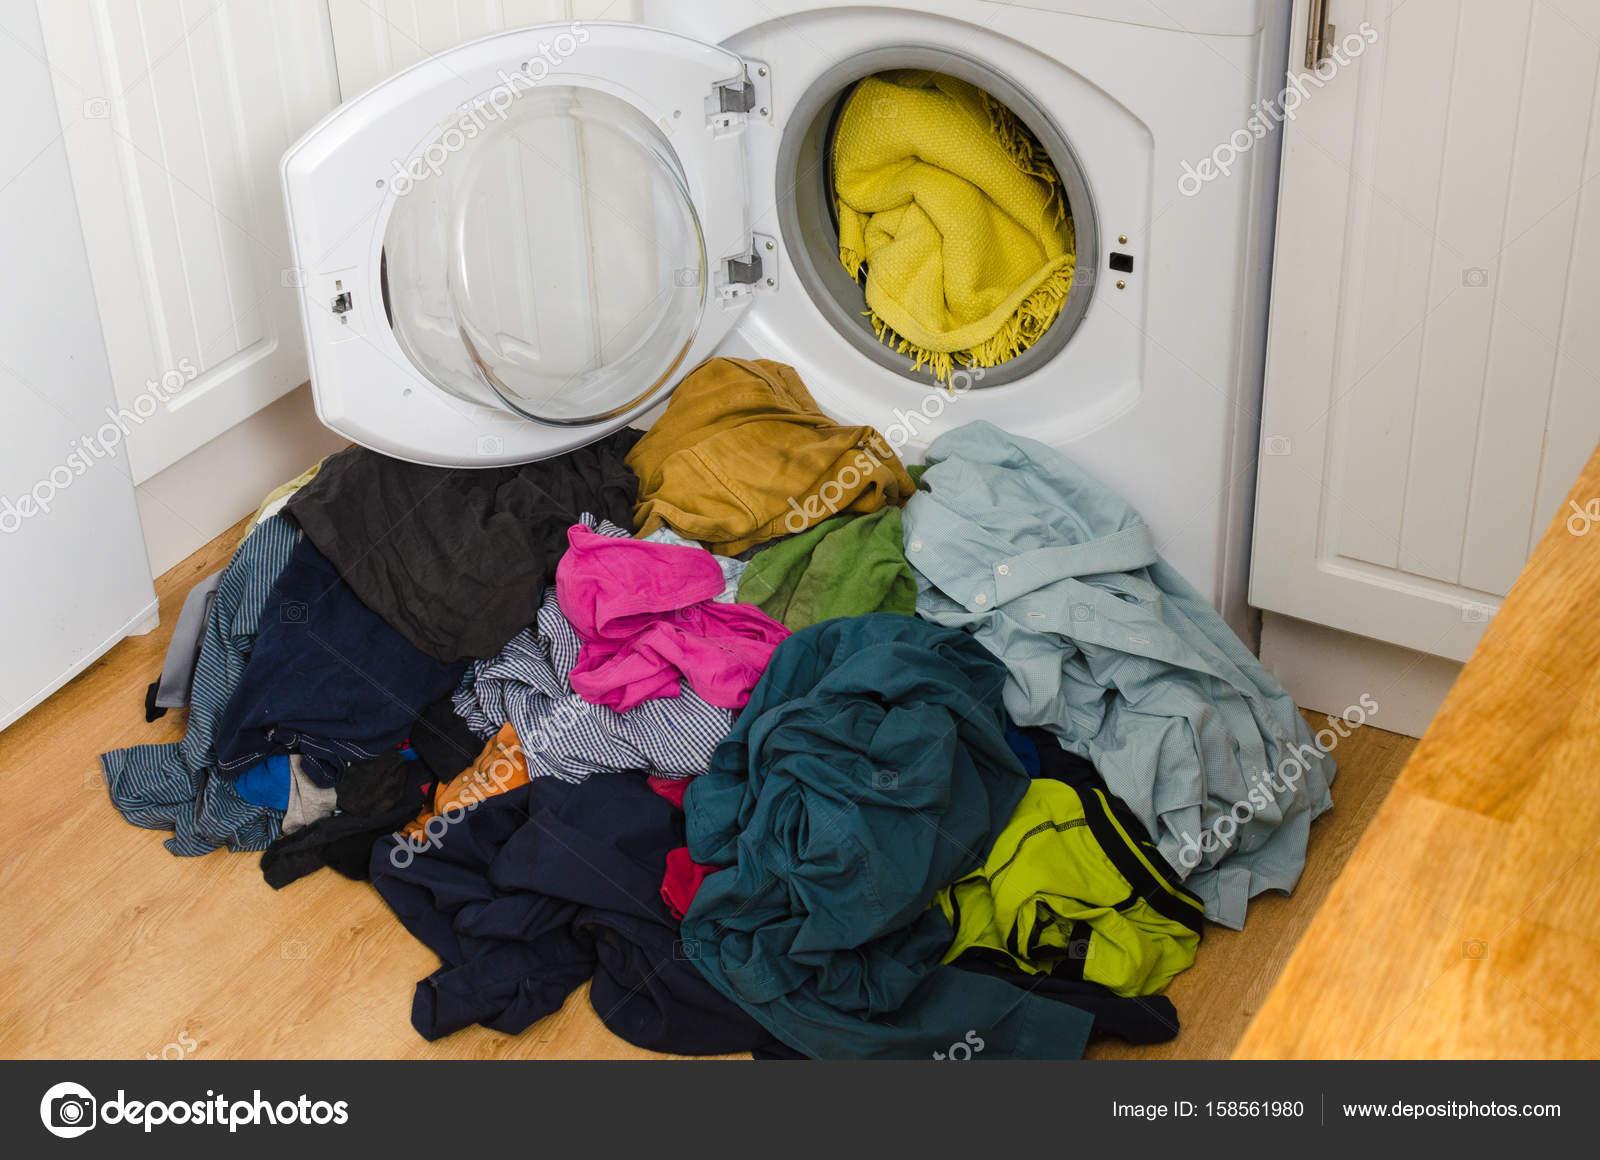 Colorful Pile Of Laundry At The Washing Machine Stock Photo